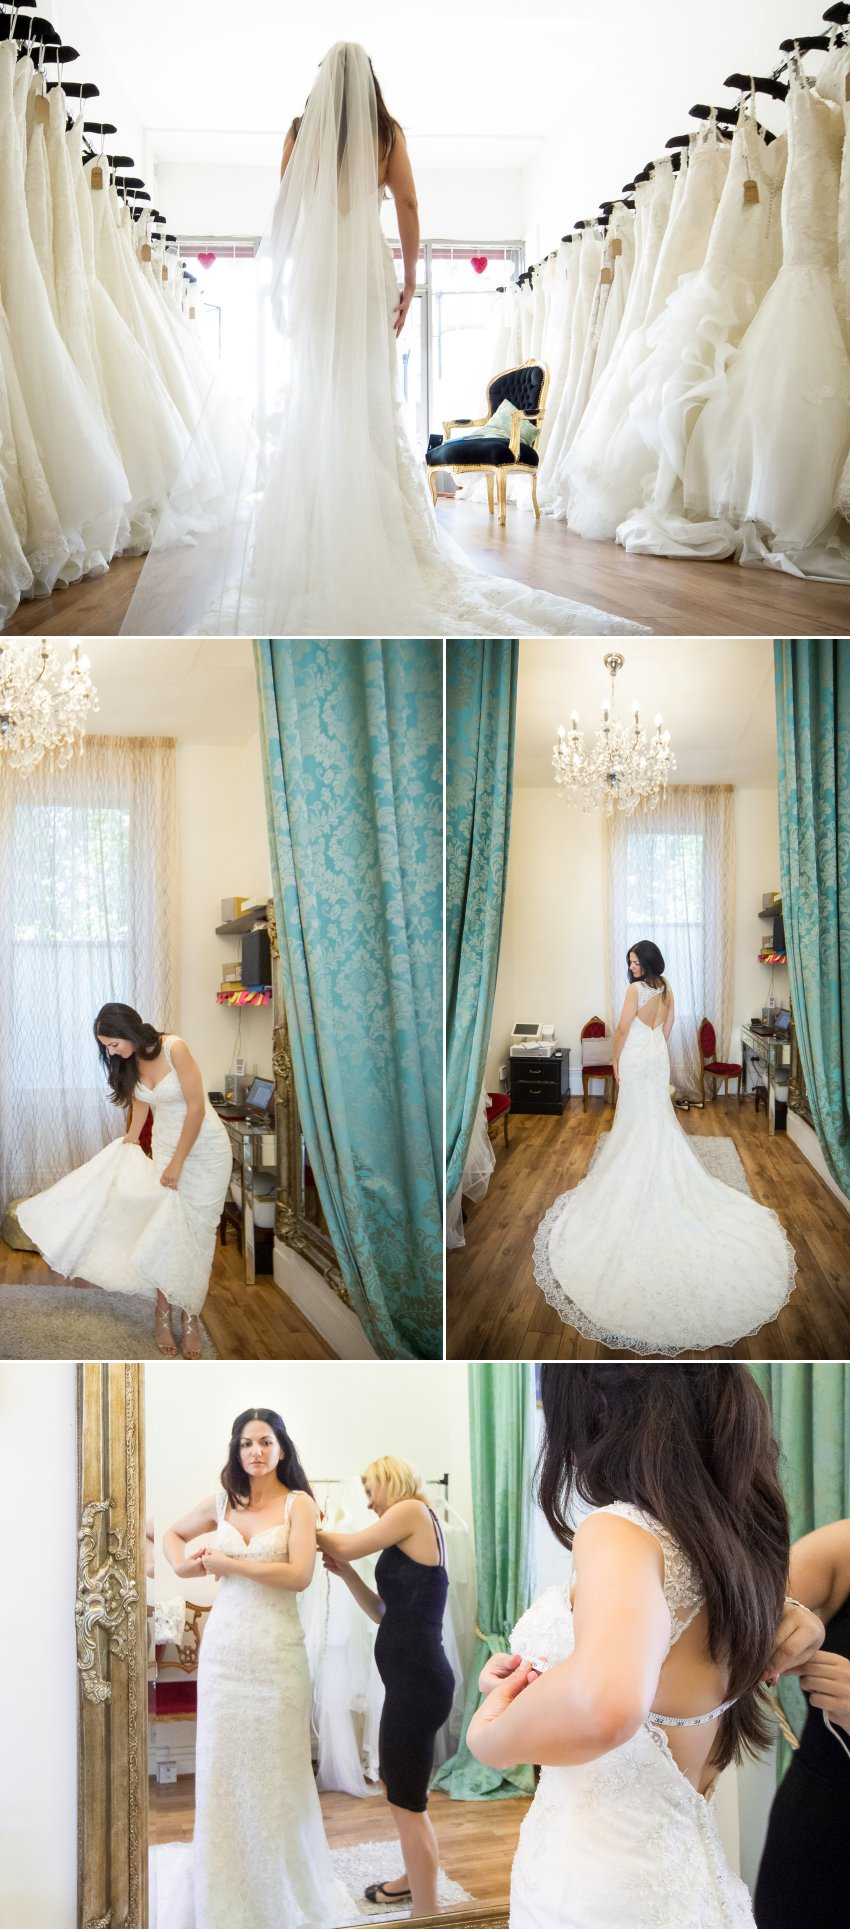 02 Nigerian wedding at Rosewood Hotel